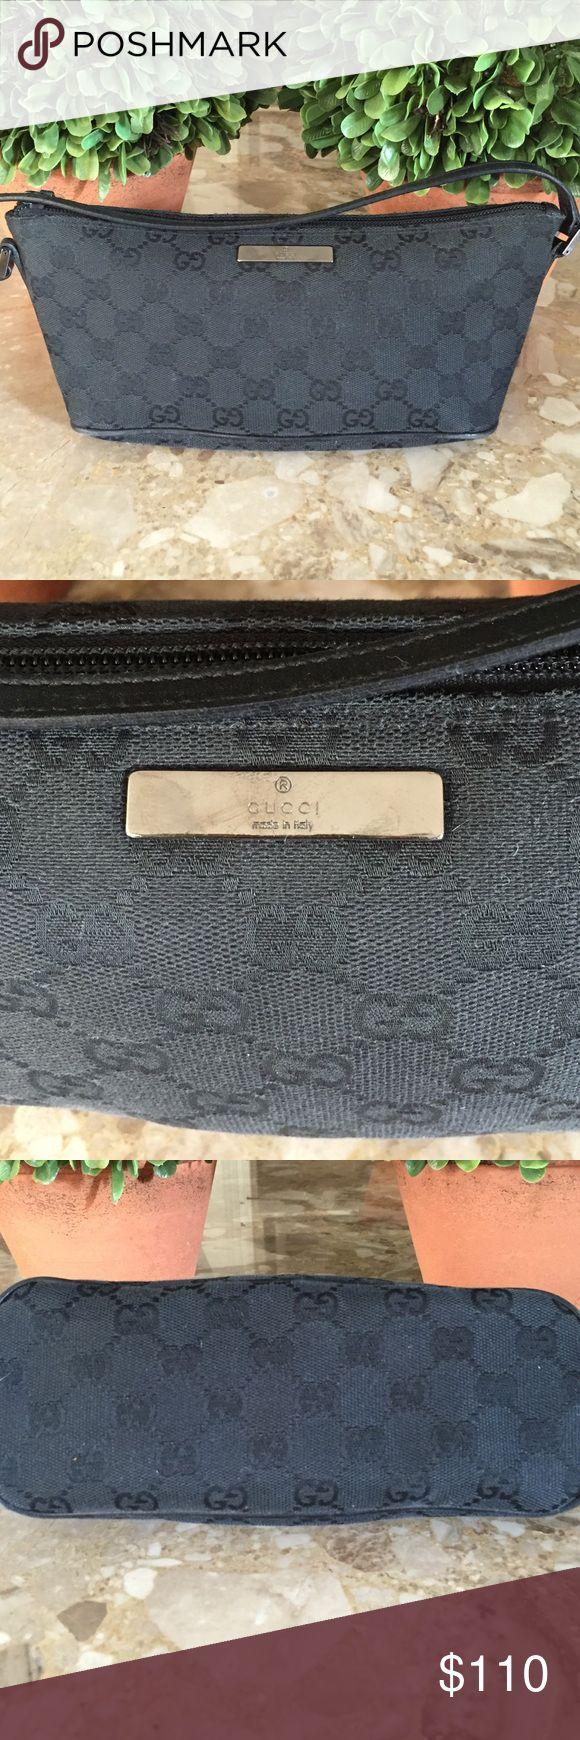 Black on black Gucci monogram pouchette Authentic Gucci black on black monogram pochette Gucci Bags Mini Bags